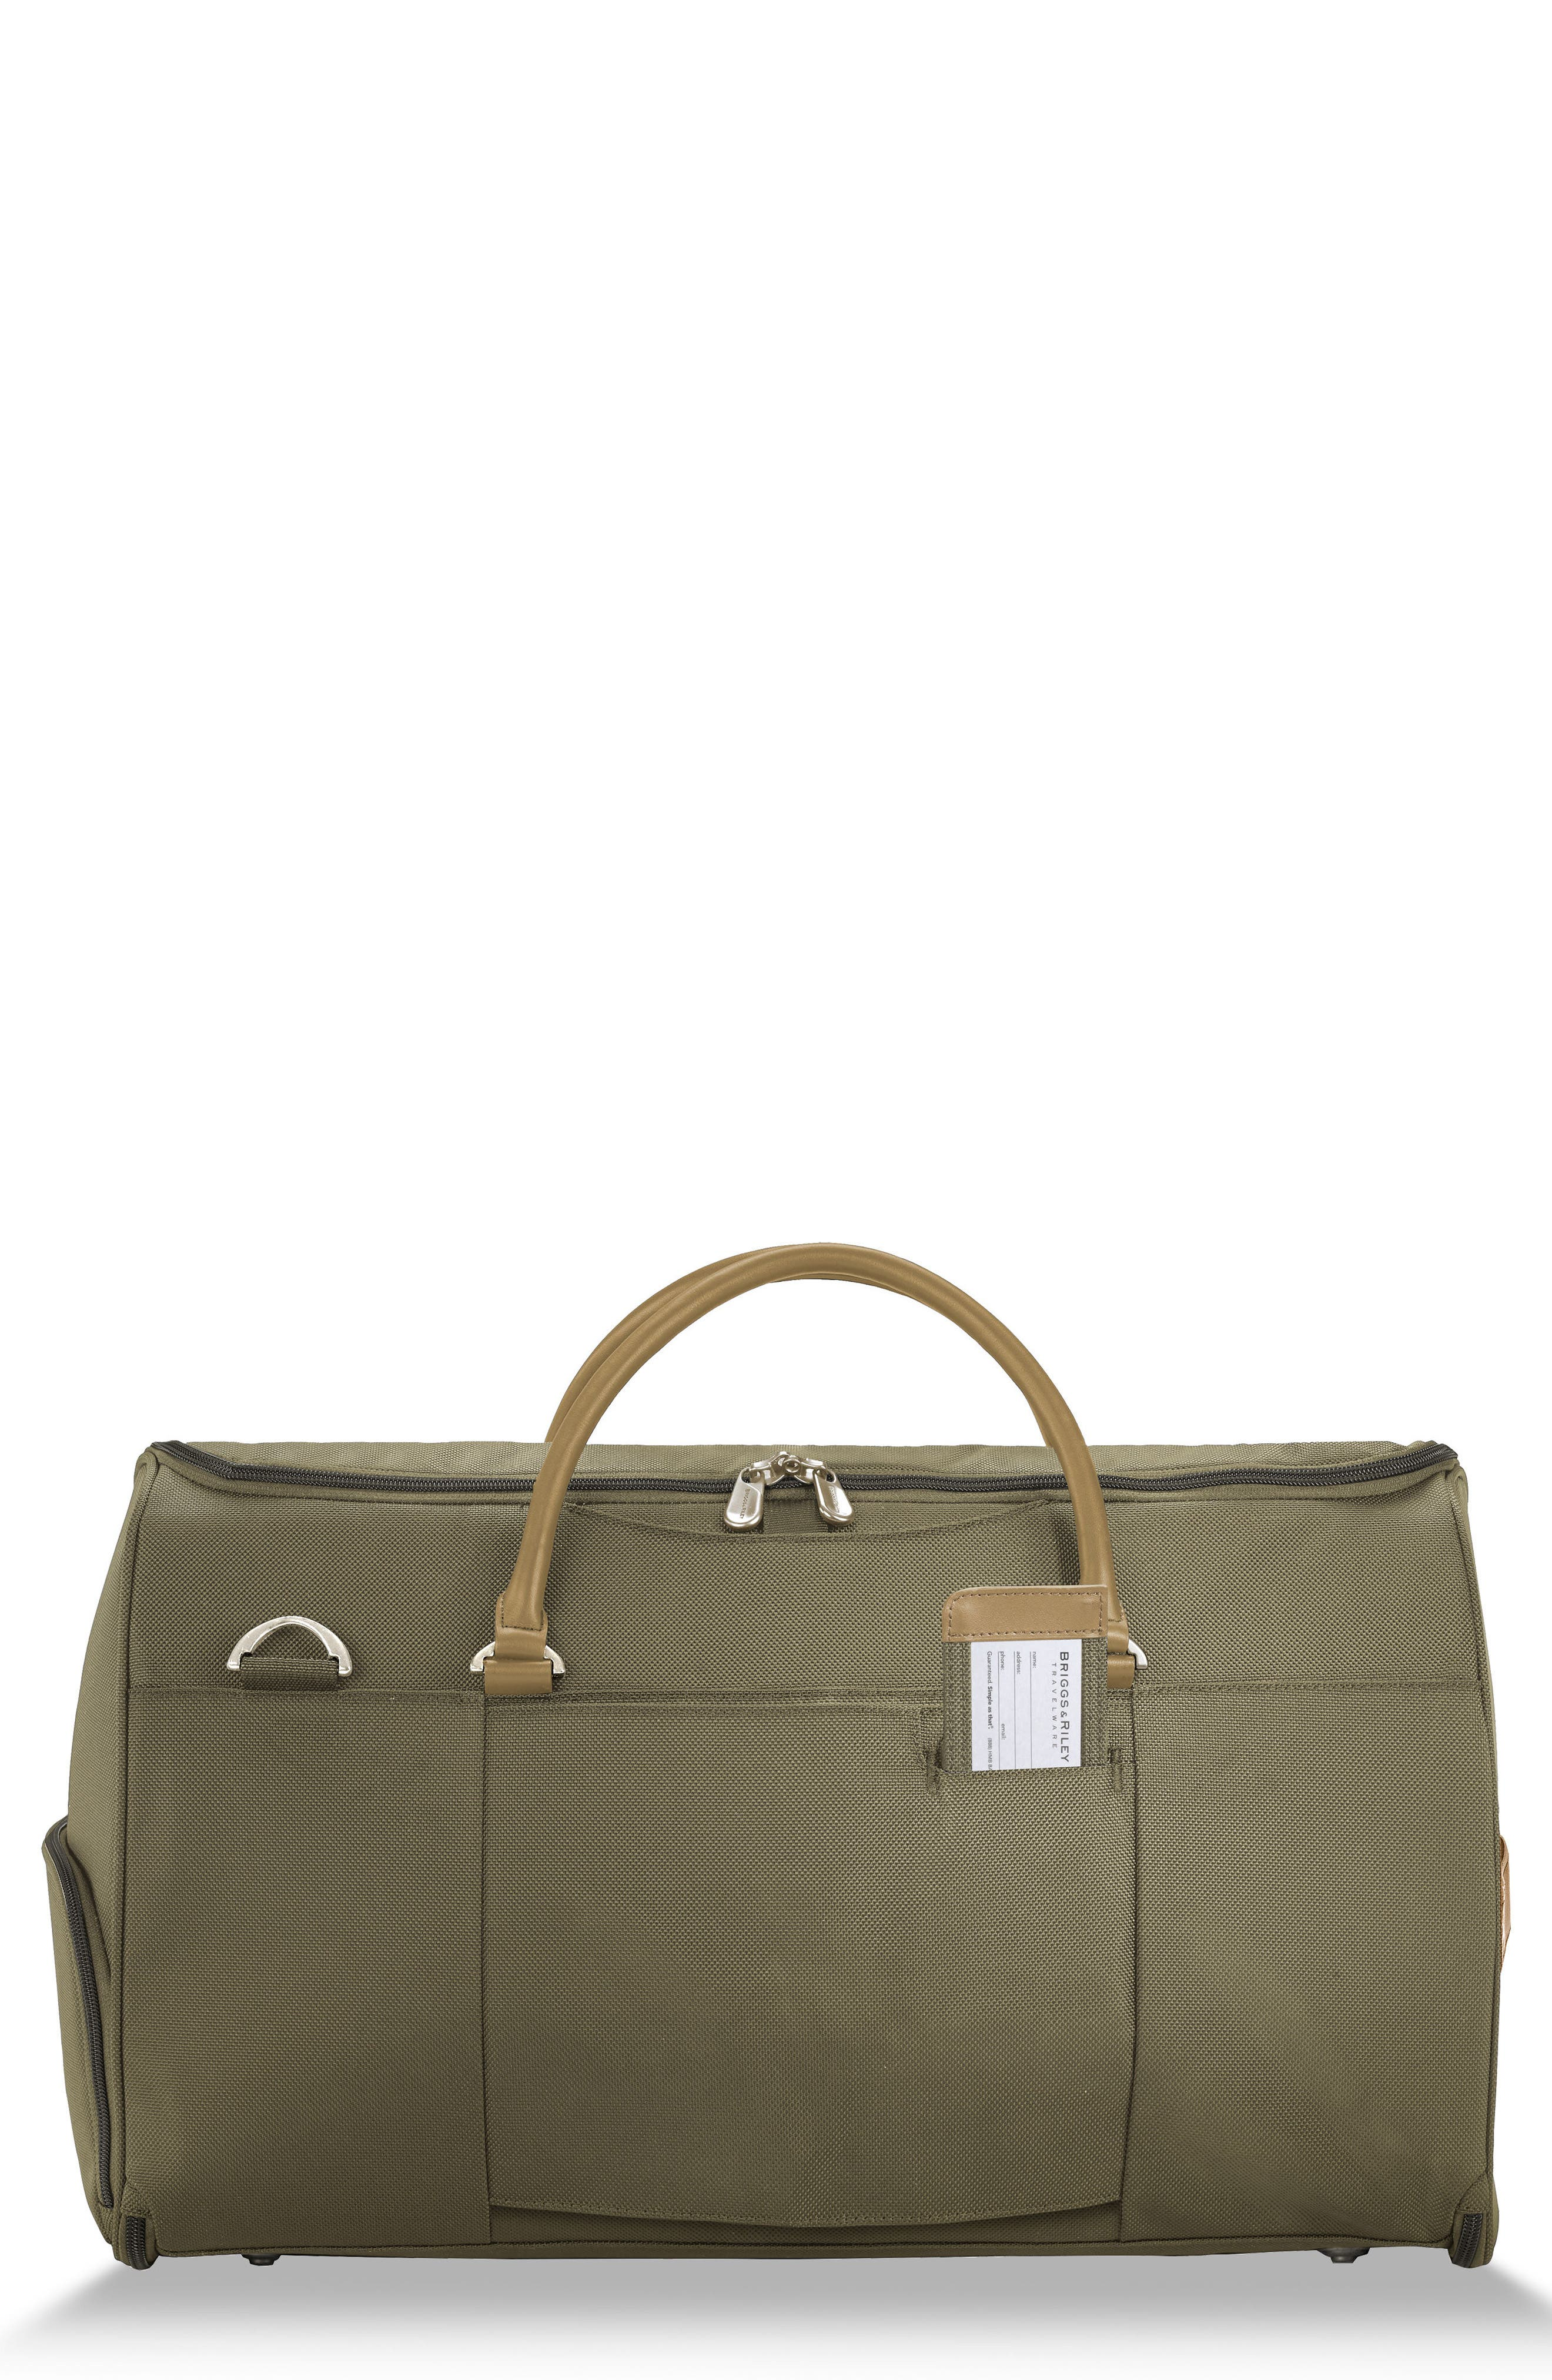 Alternate Image 1 Selected - Briggs & Riley Baseline Suiter Duffel Bag